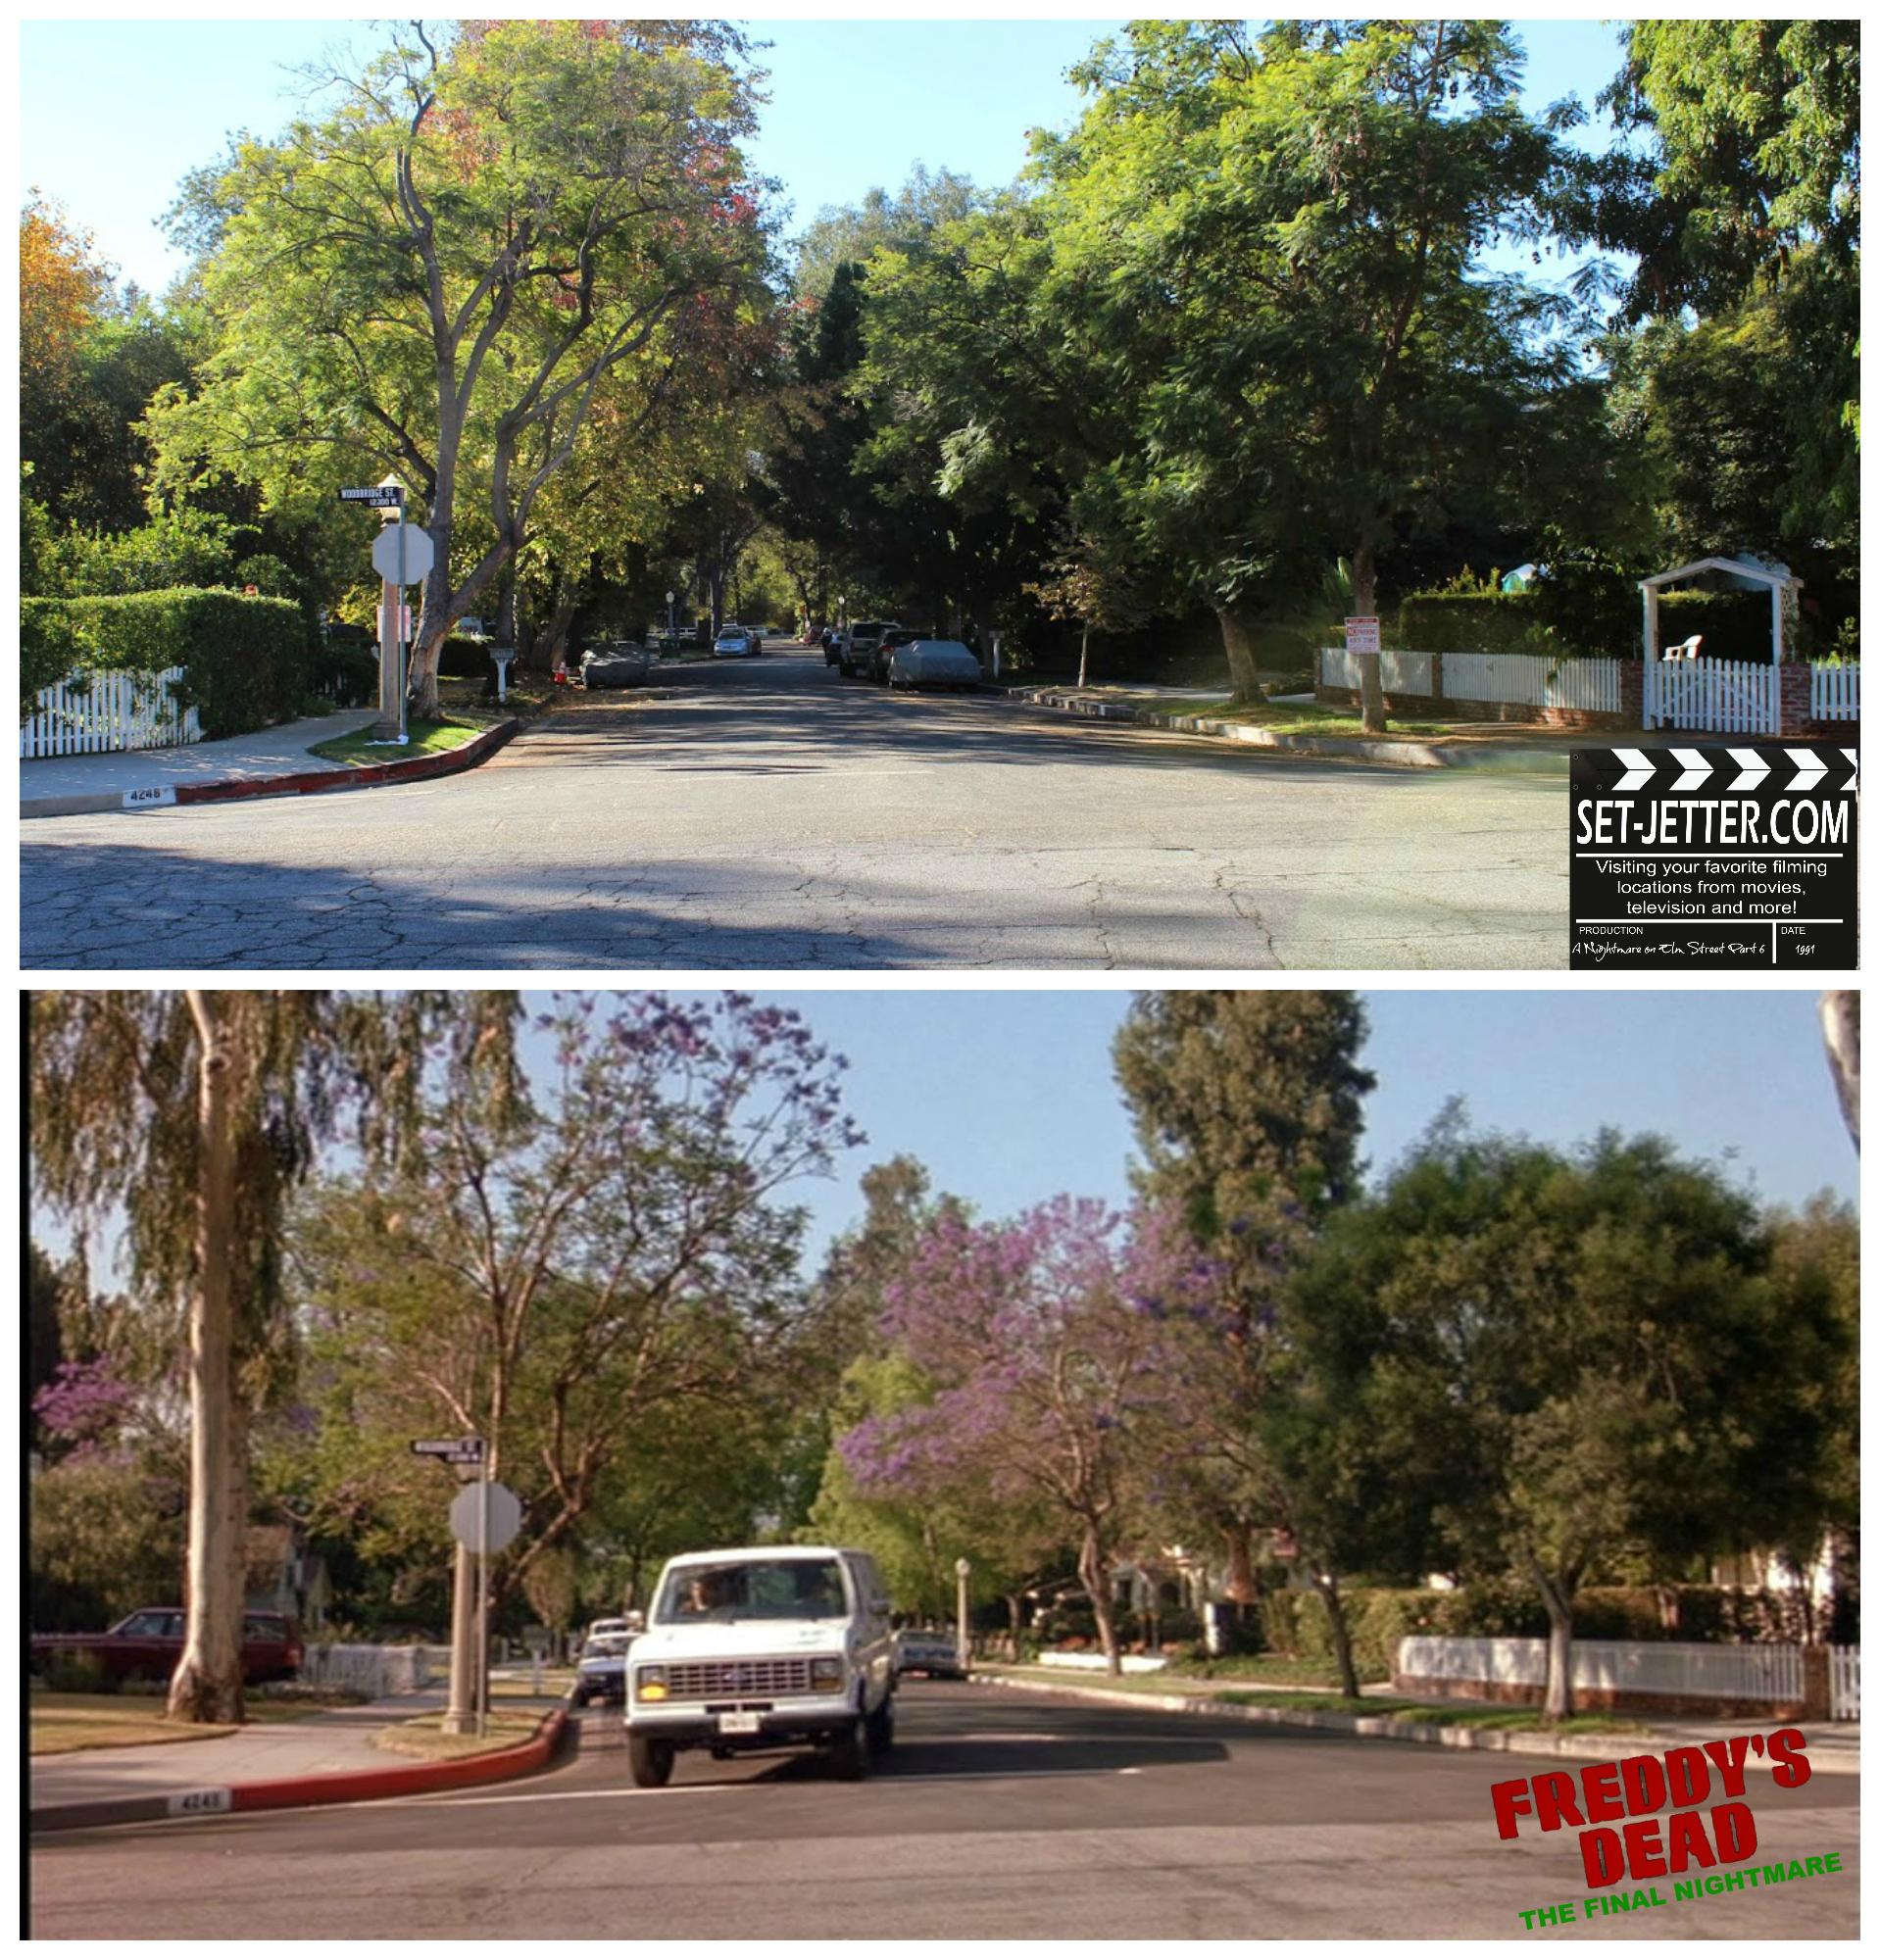 Nightmare on Elm Street Part 6 comparison 15g.jpg